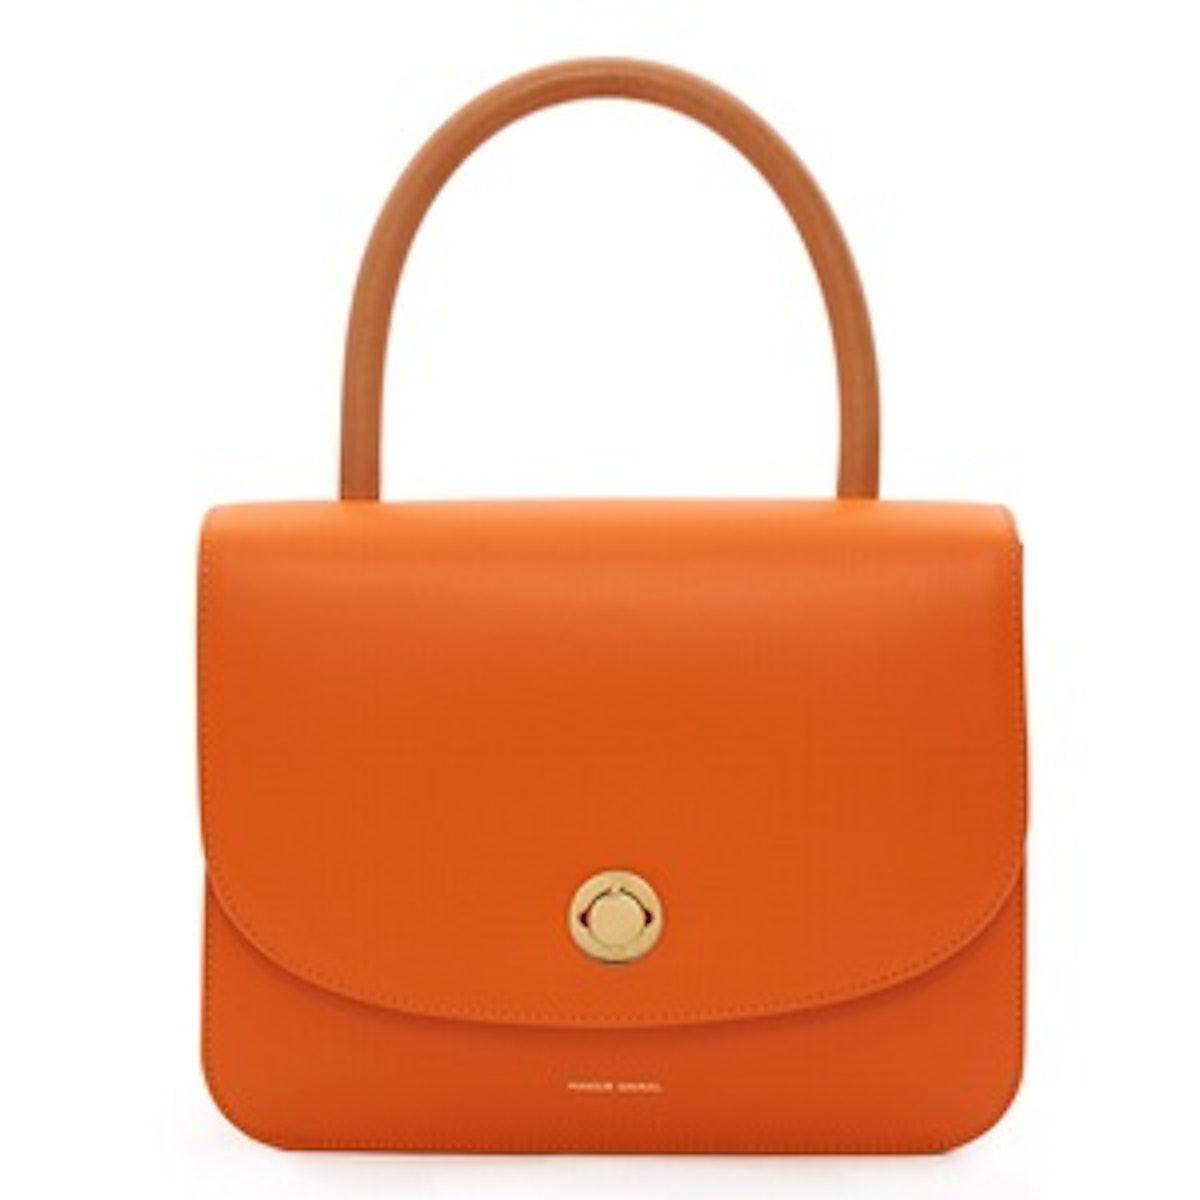 Metropolitan Calf Leather Bag